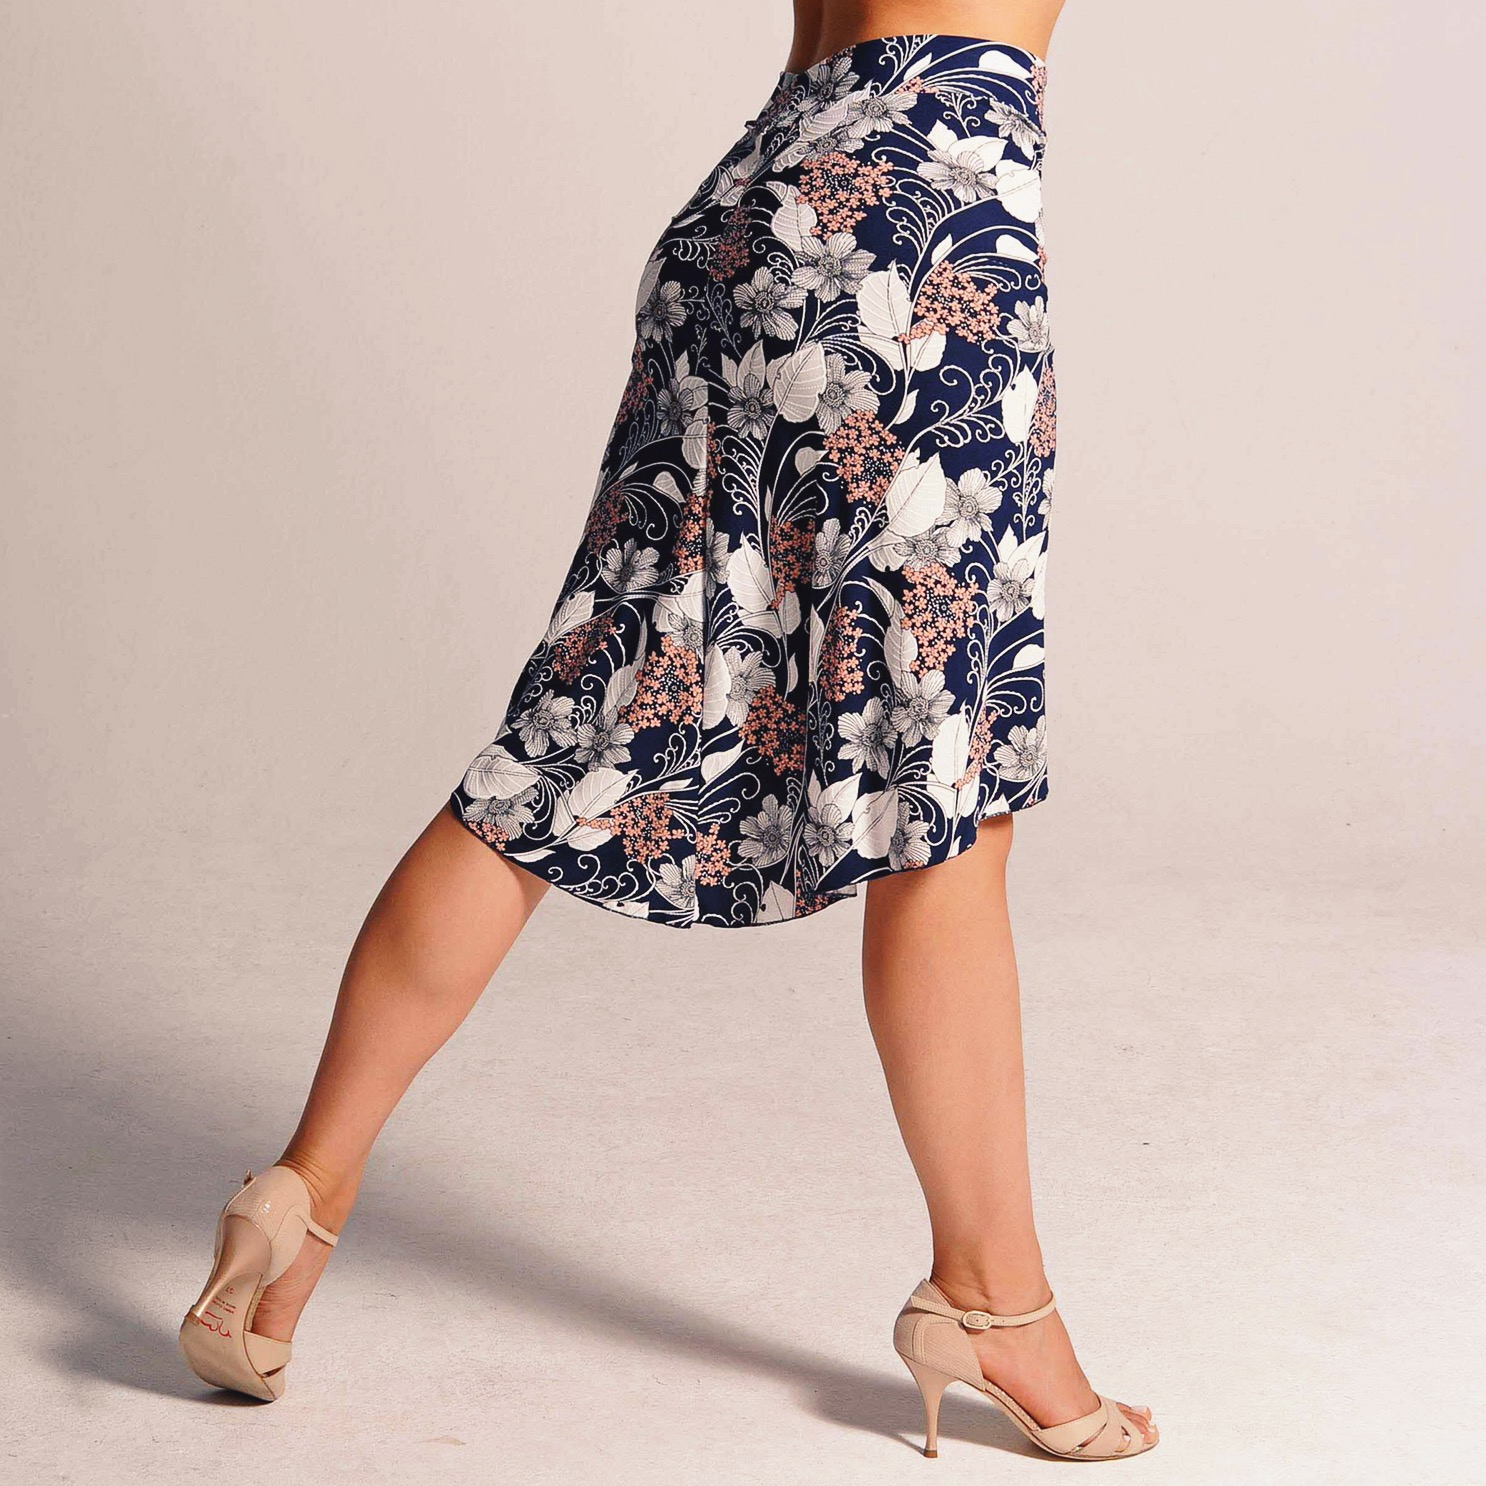 tango_skirt_tango_shoes_coleccion_berlin.JPG